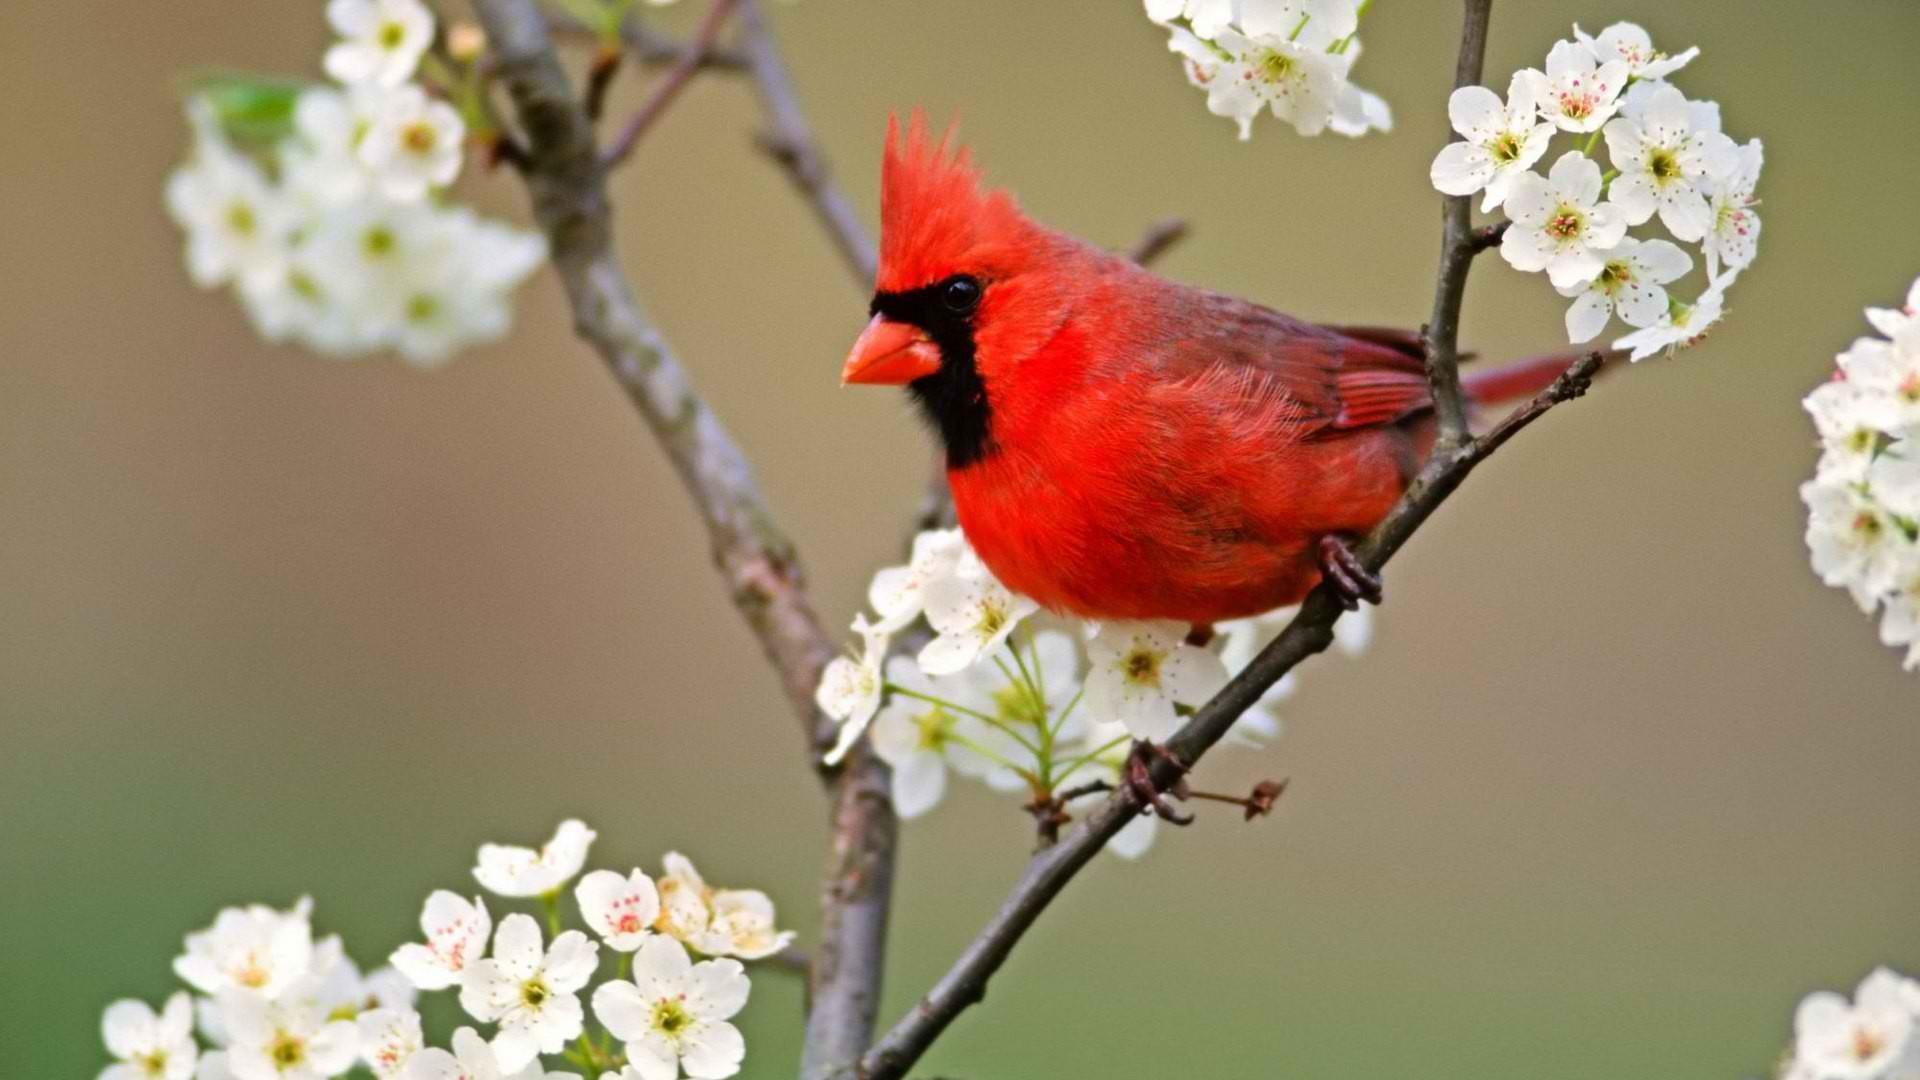 43   birds and blooms winter wallpaper on wallpapersafari